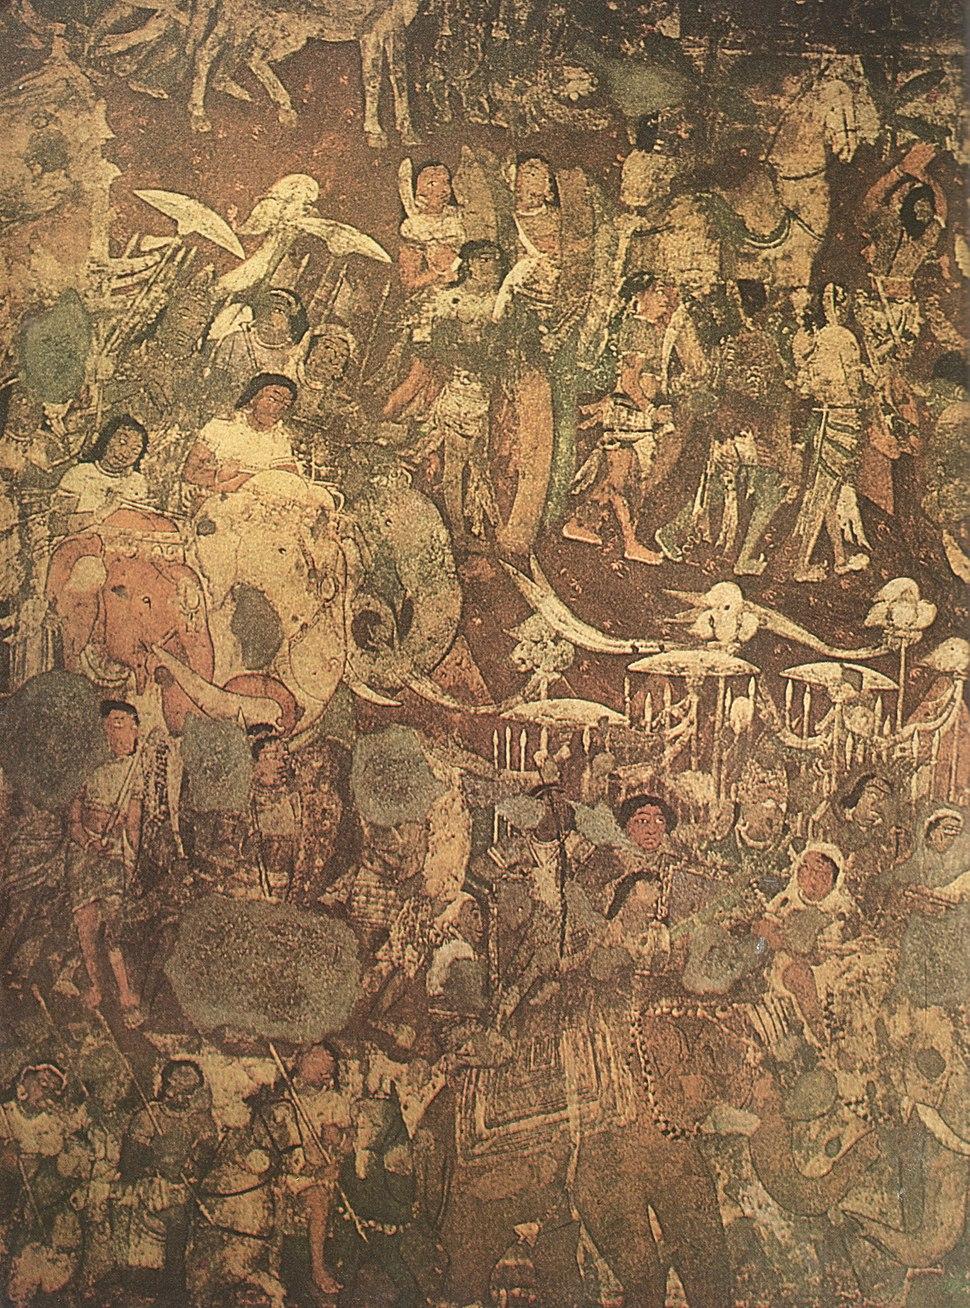 Coming Of Sinhala (Mural At Ajanta In Cave No 17)